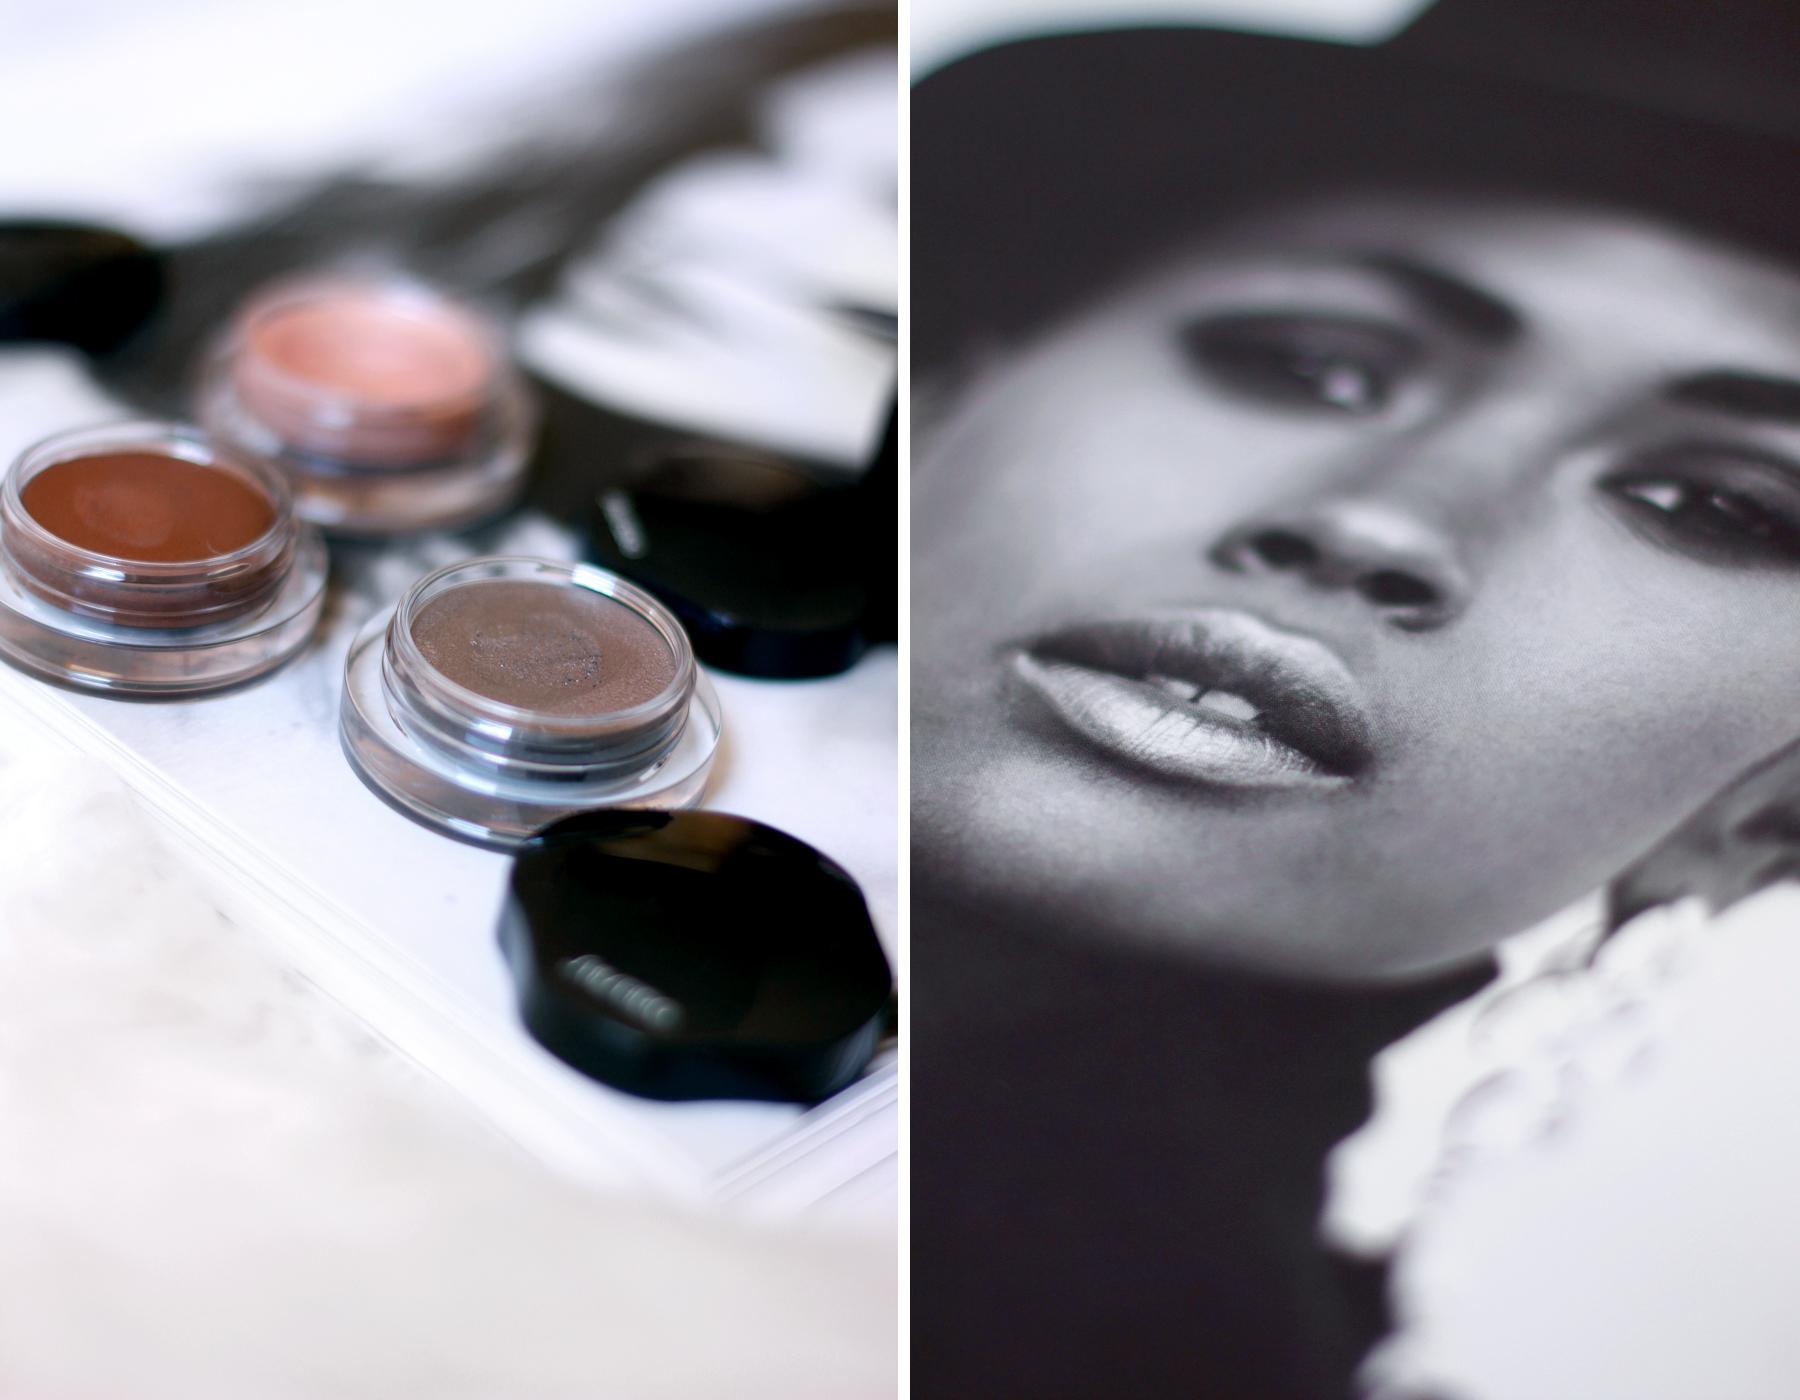 nude look beauty favorites summer 2015 shiseido l'oreal m.a.c. douglas beautyblogger ricarda schernus düsseldorf berlin 6